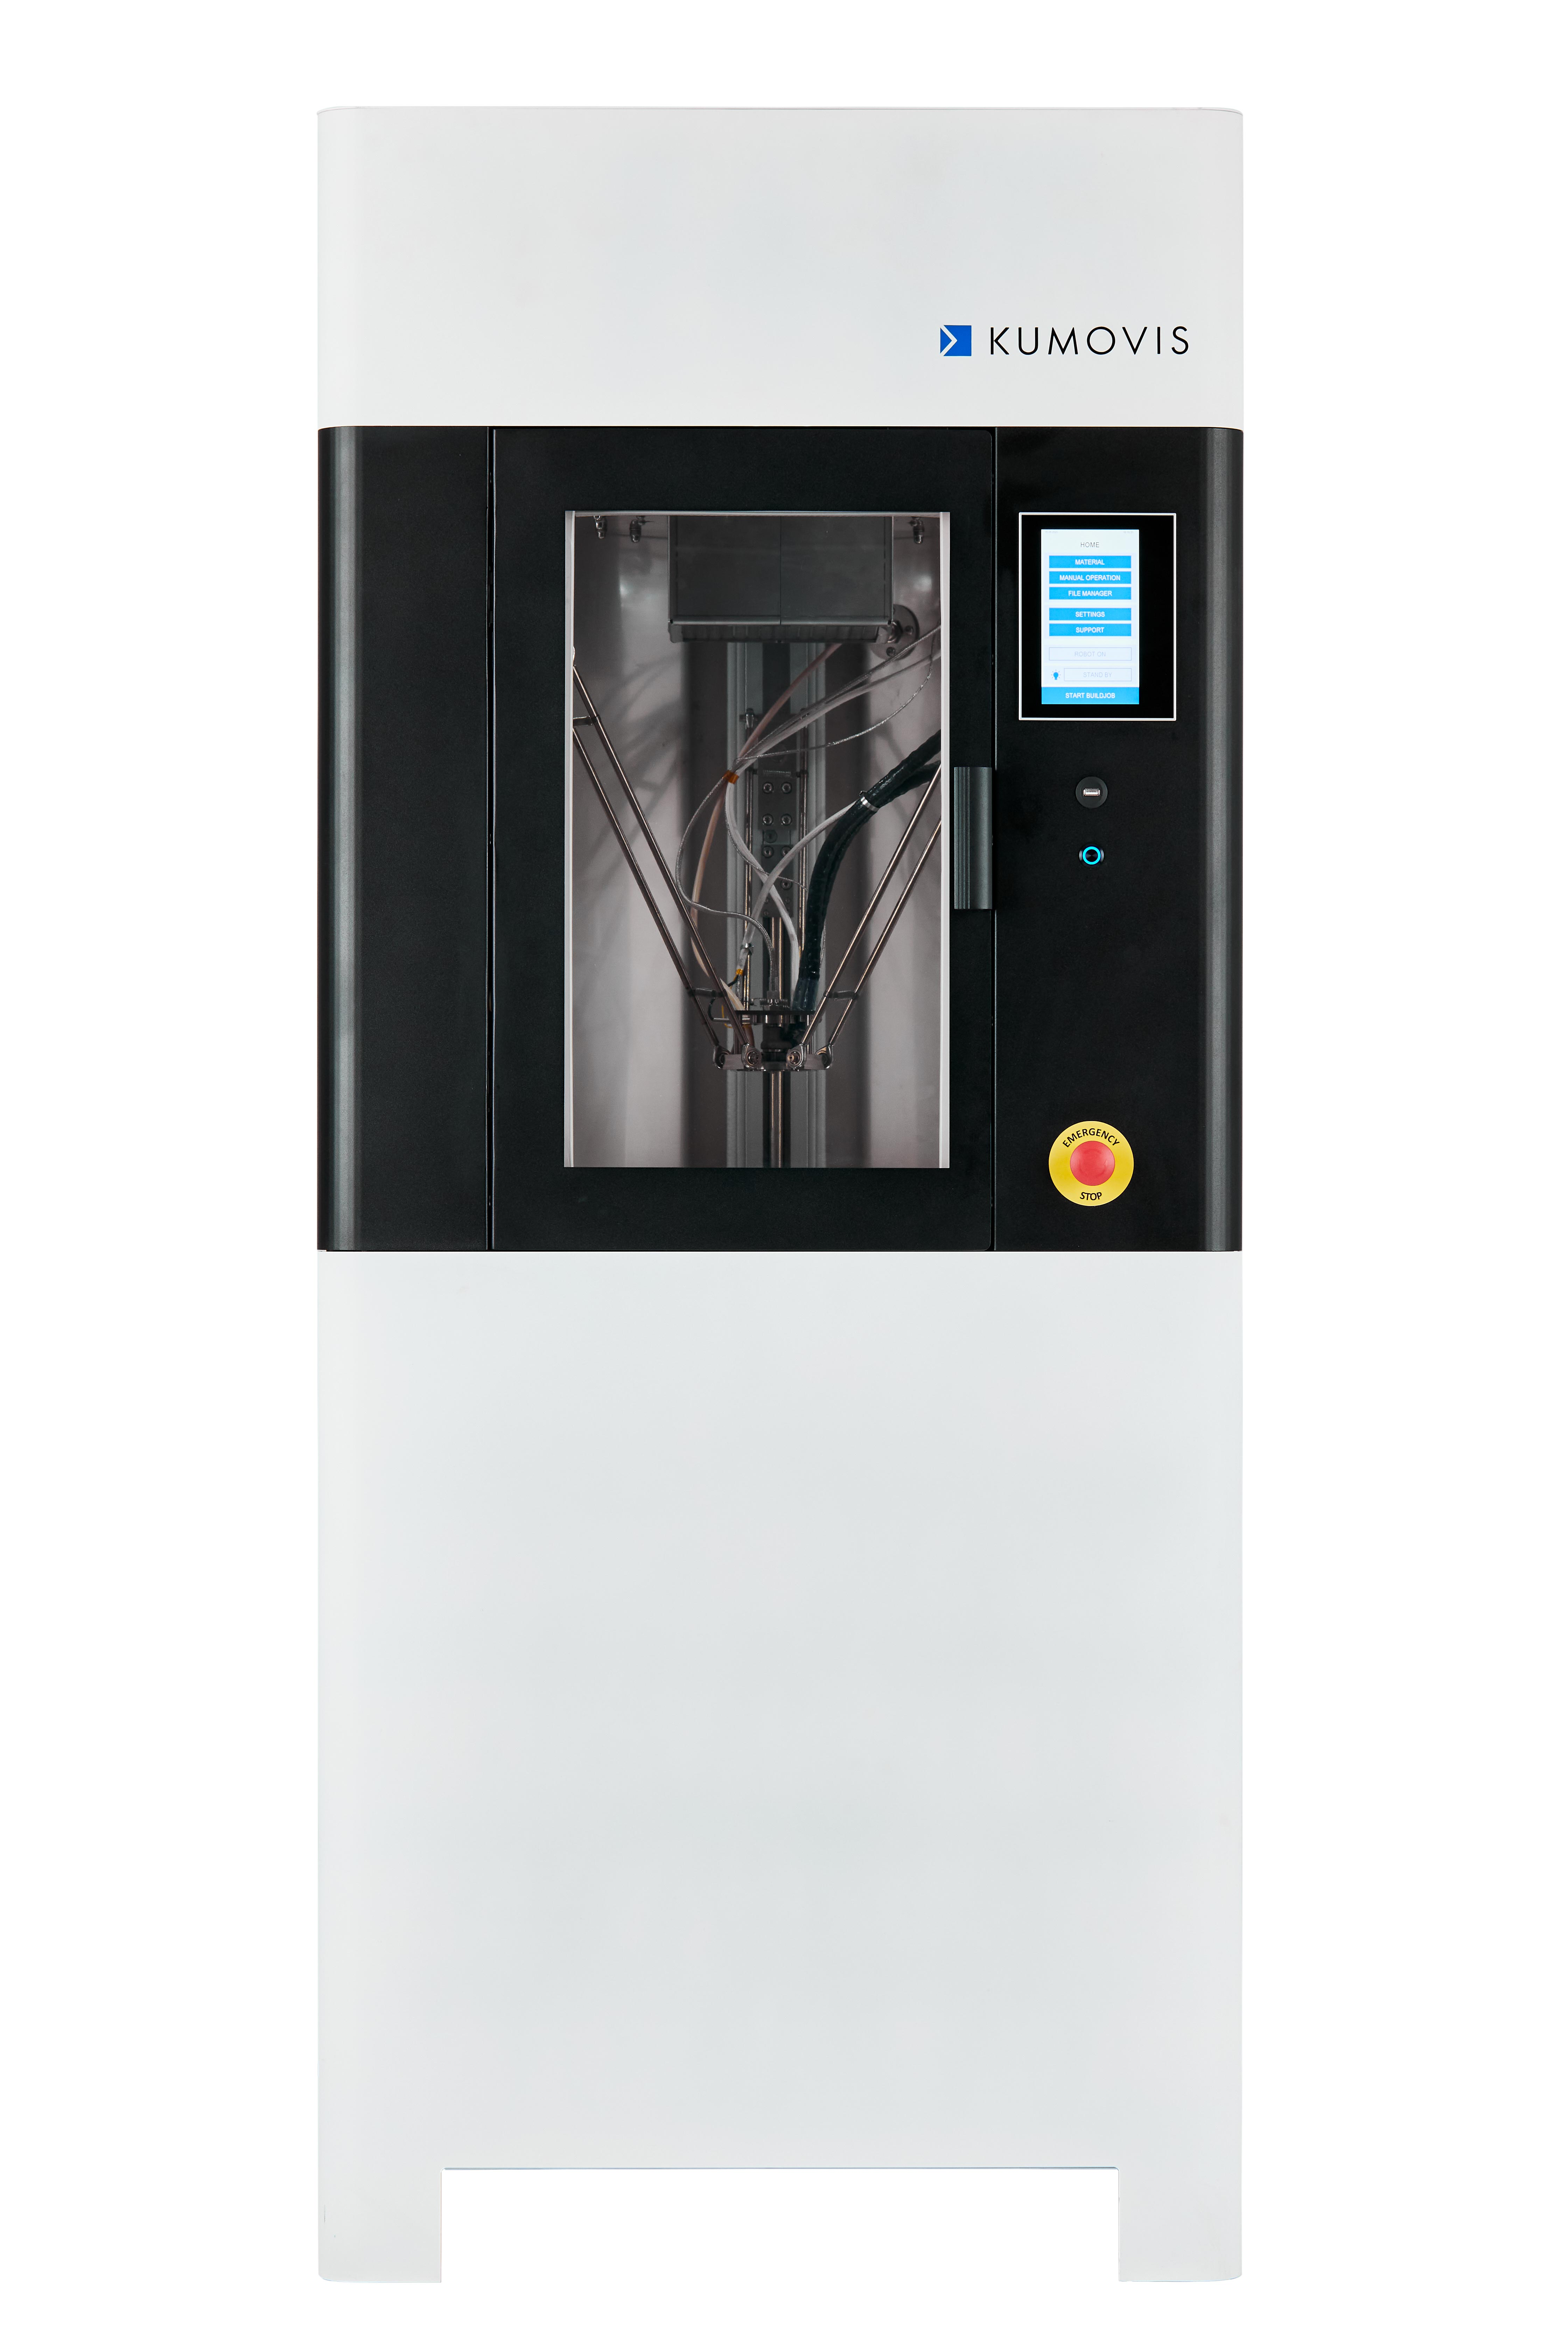 Kumovis R1 3D printer. Photo via Kumovis.